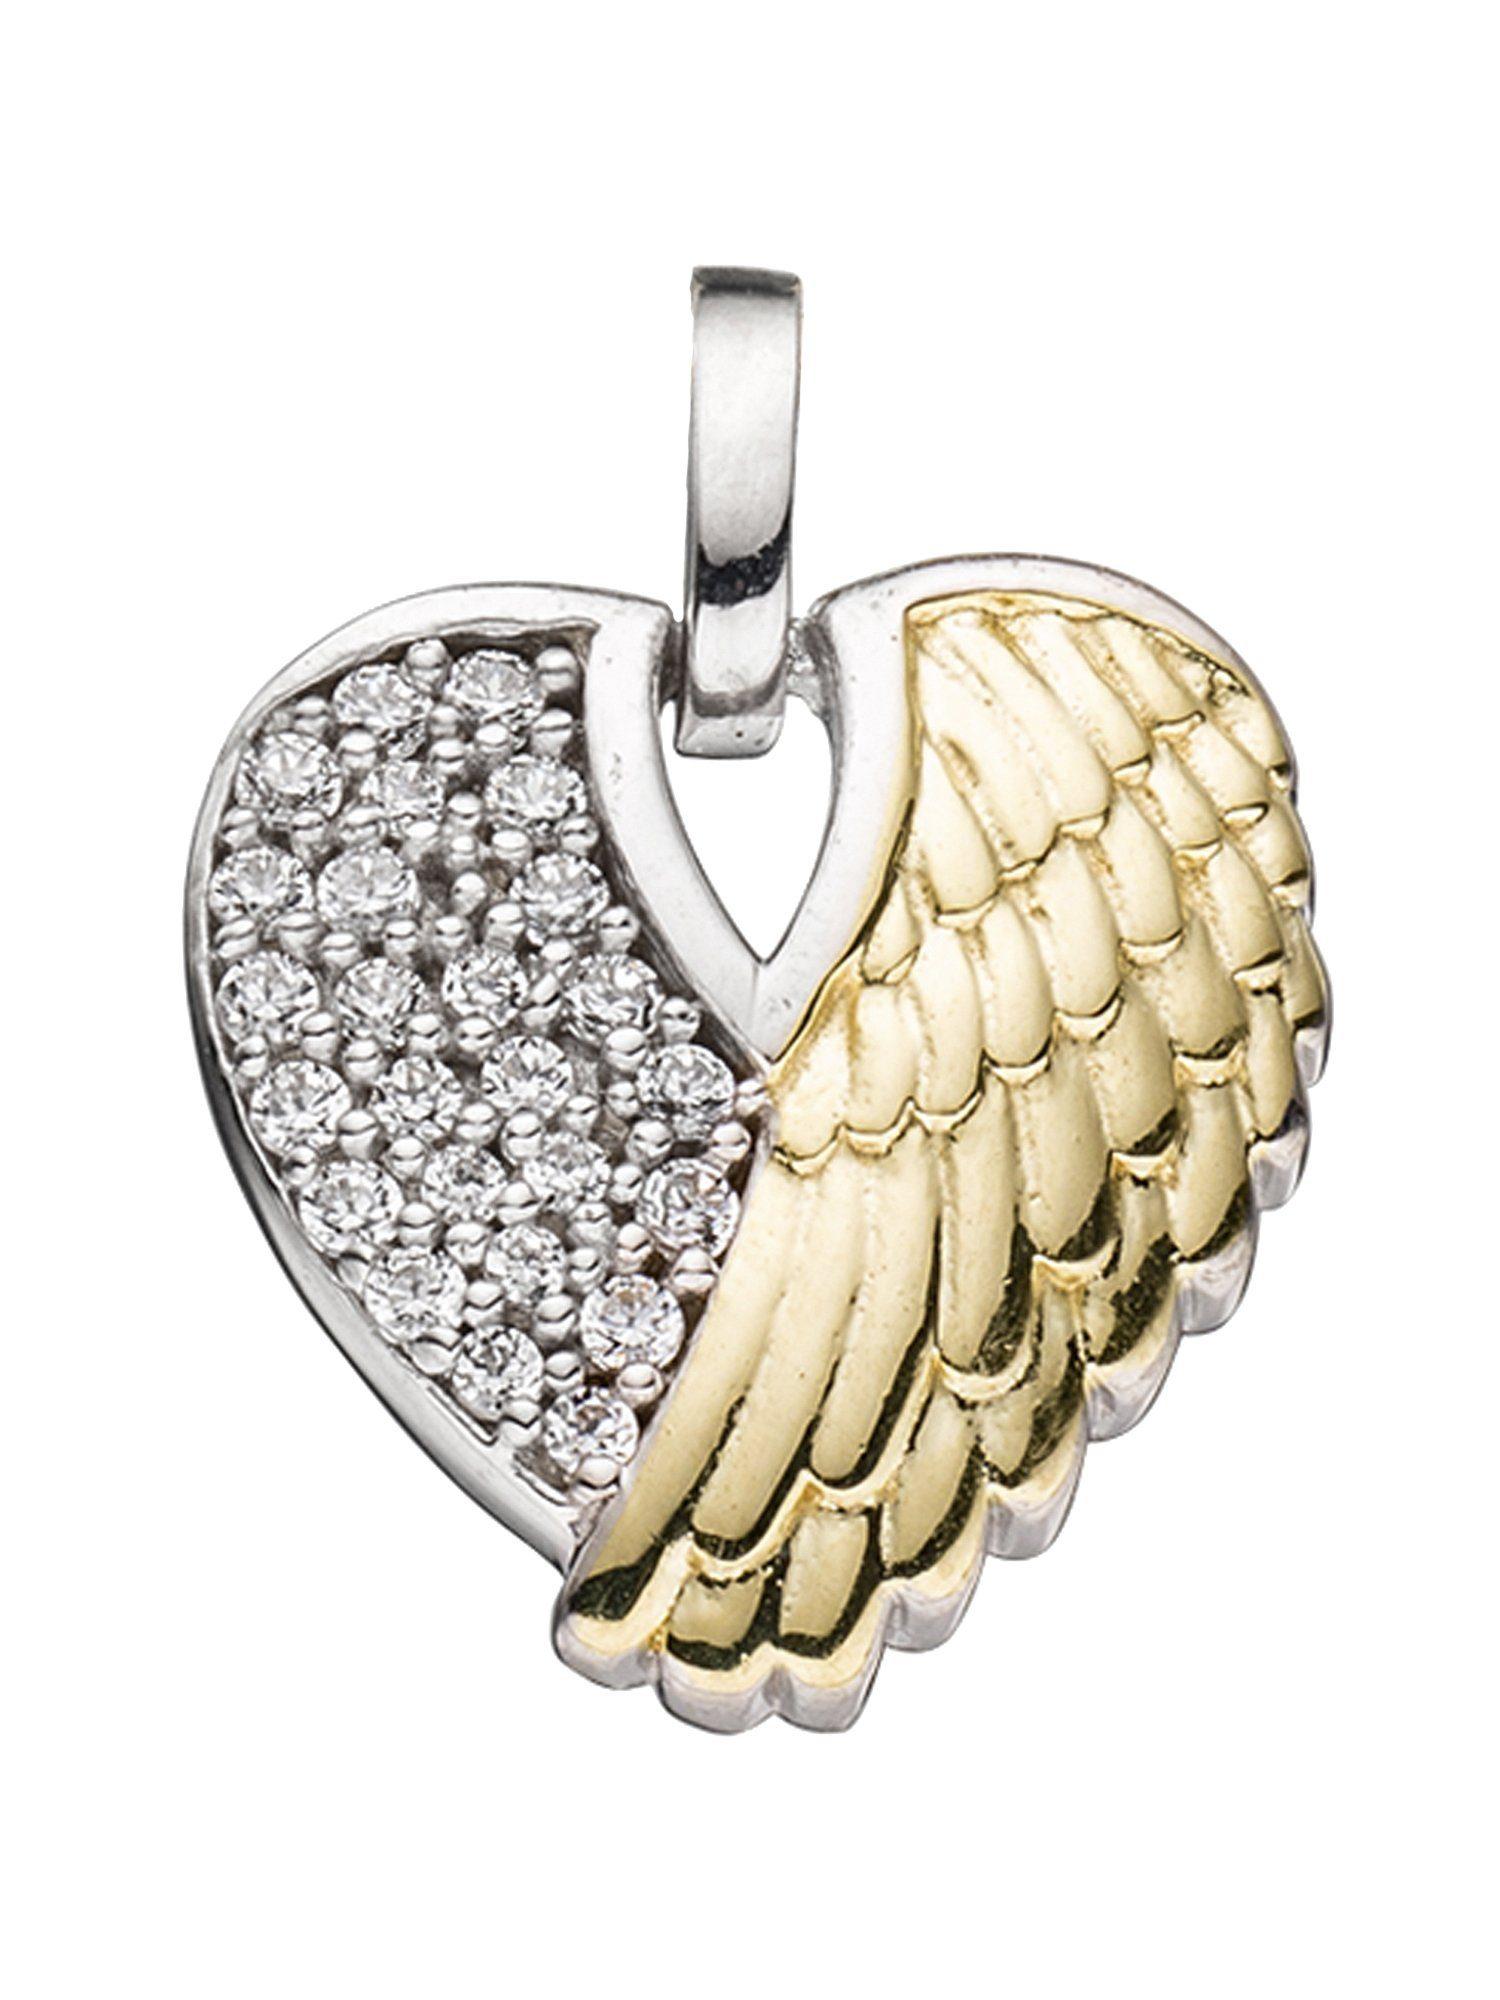 Adelia´s Kettenanhänger »Herz / Flügel Anhänger«, 925 Silber mit Zirkonia